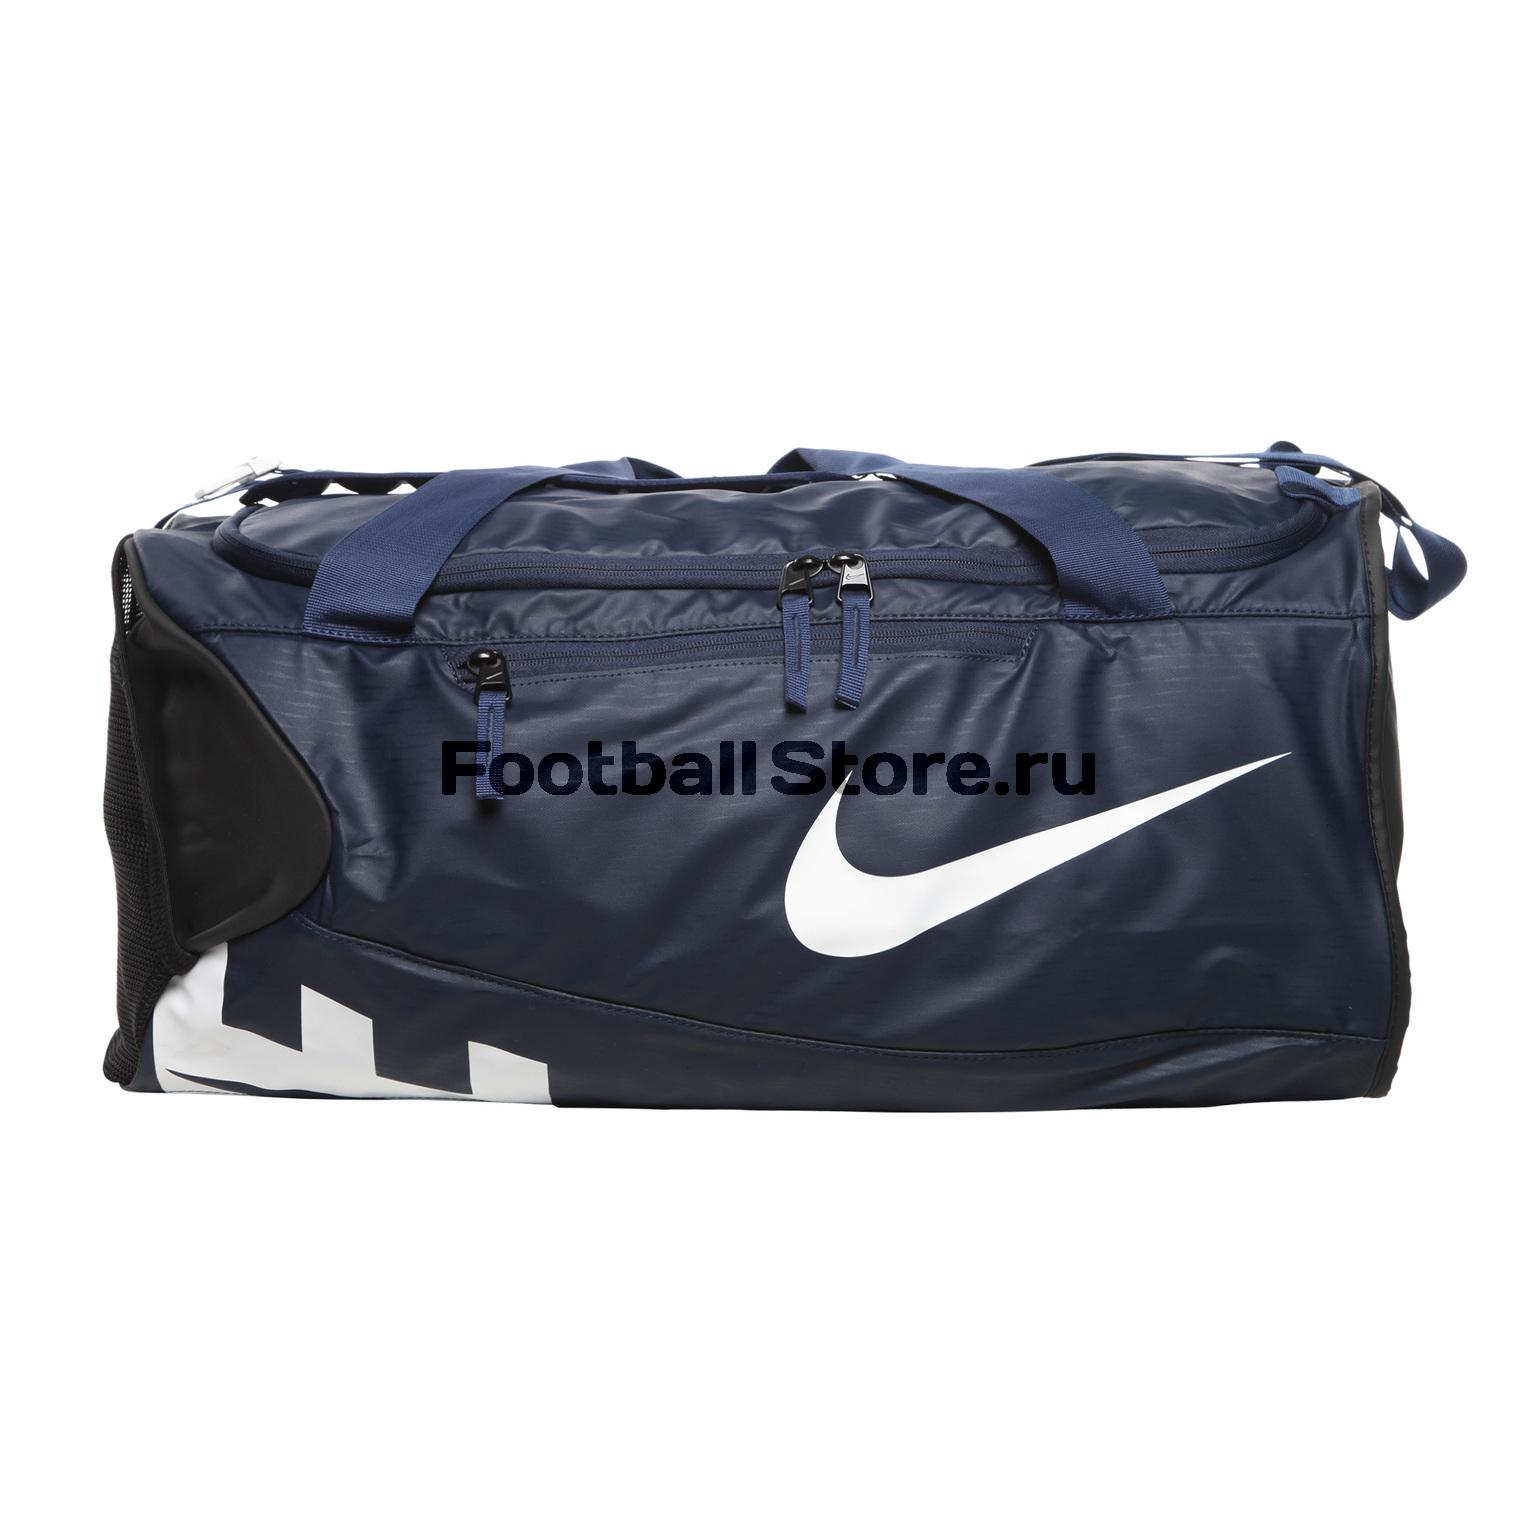 Сумки/Рюкзаки Nike Сумка Nike NK Alpha Duff BA5182-410 сумки рюкзаки alpha cумка alpha keepers players action 9101